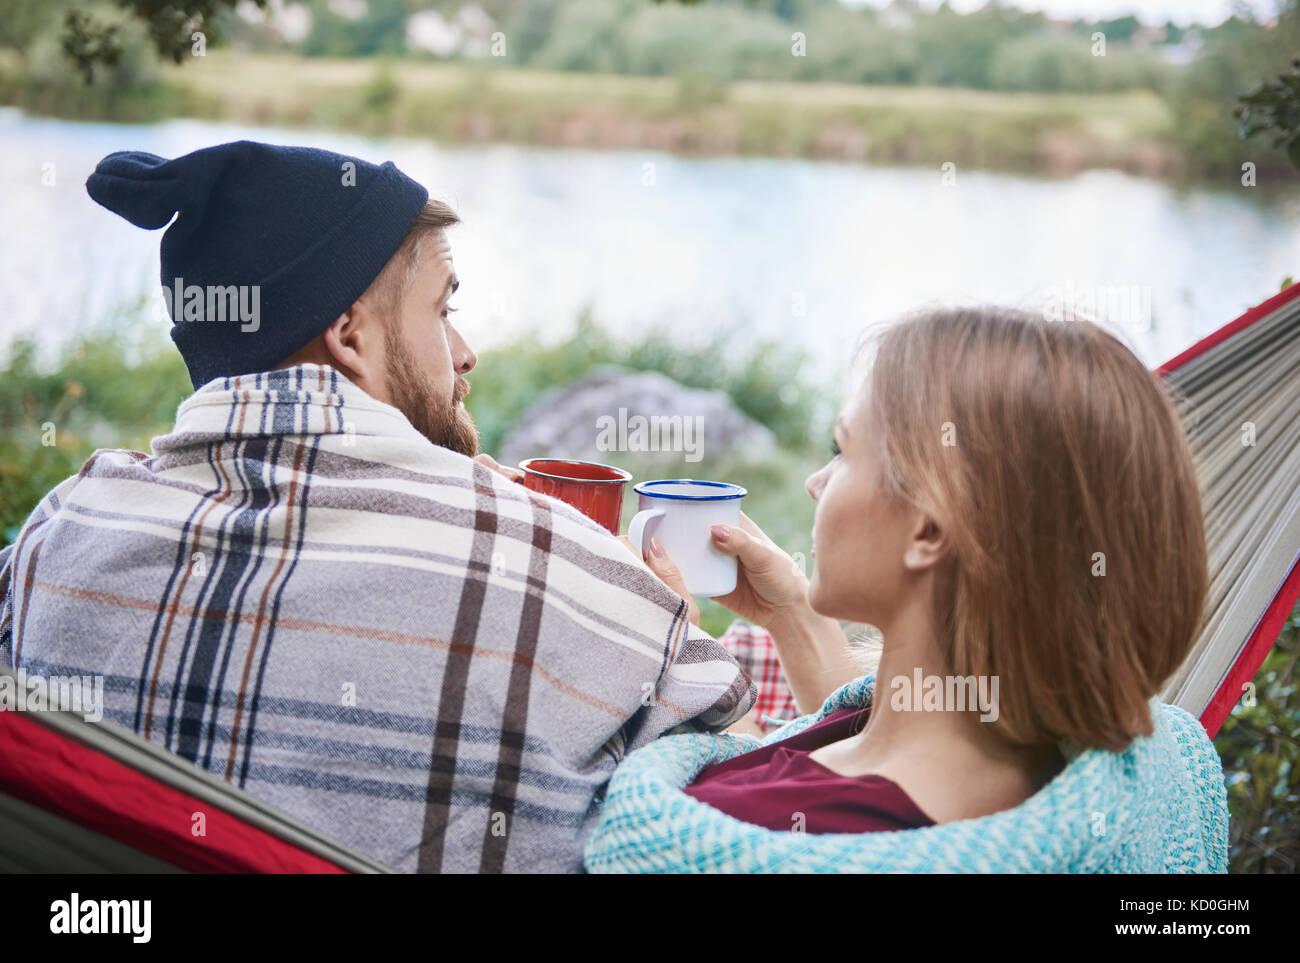 Rear view of couple in hammock holding enamel mugs, Krakow, Malopolskie, Poland, Europe - Stock Image